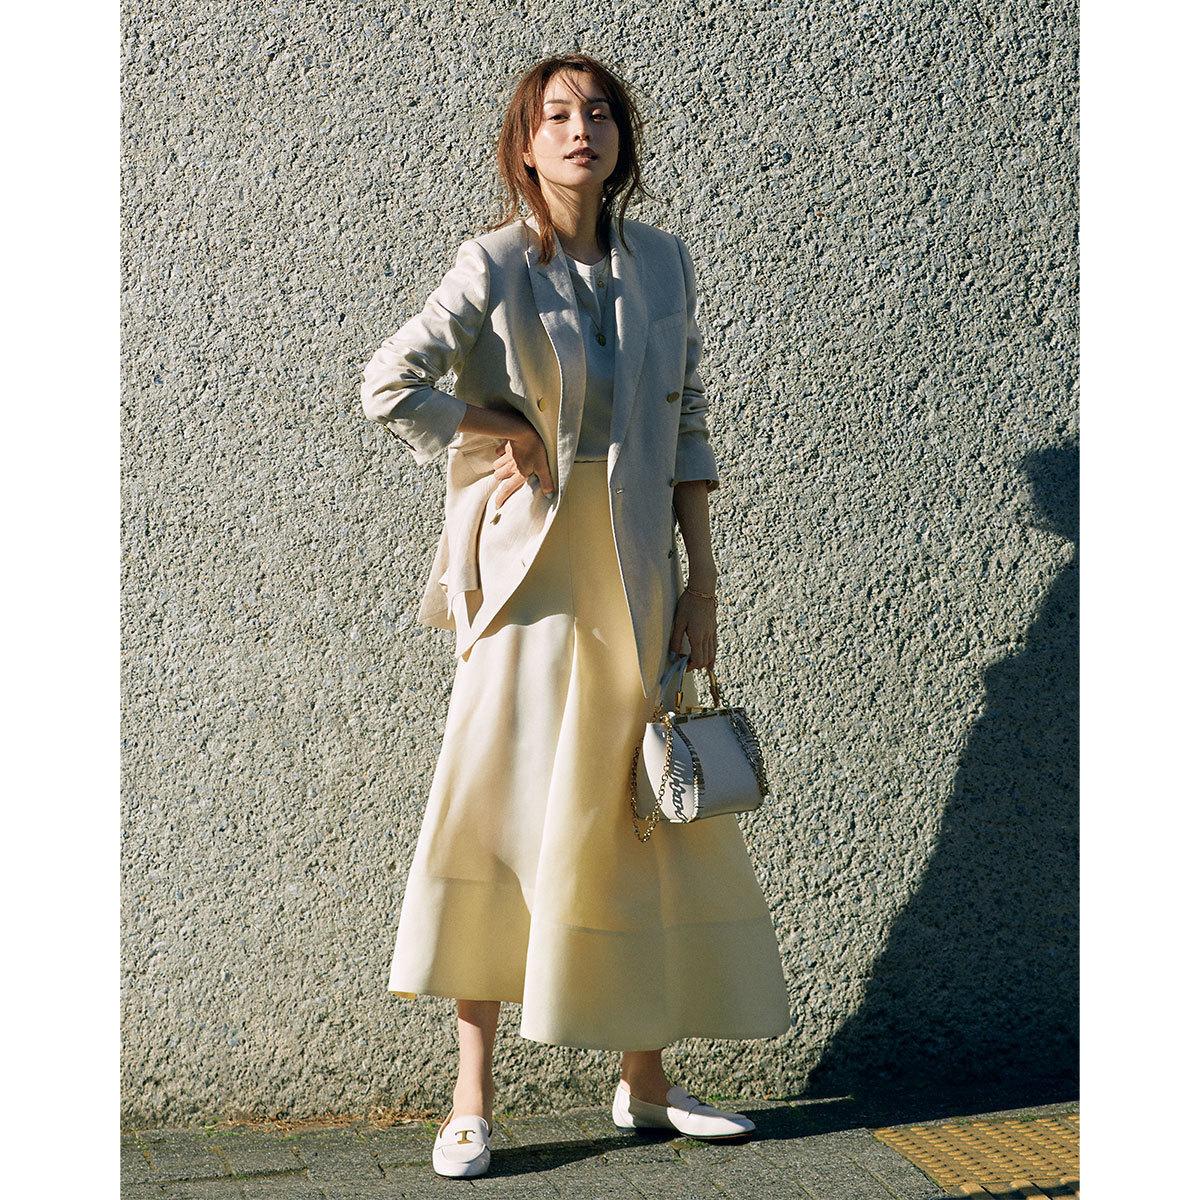 ■Skirt フレア&透け感スカートが大人には最適チョイス